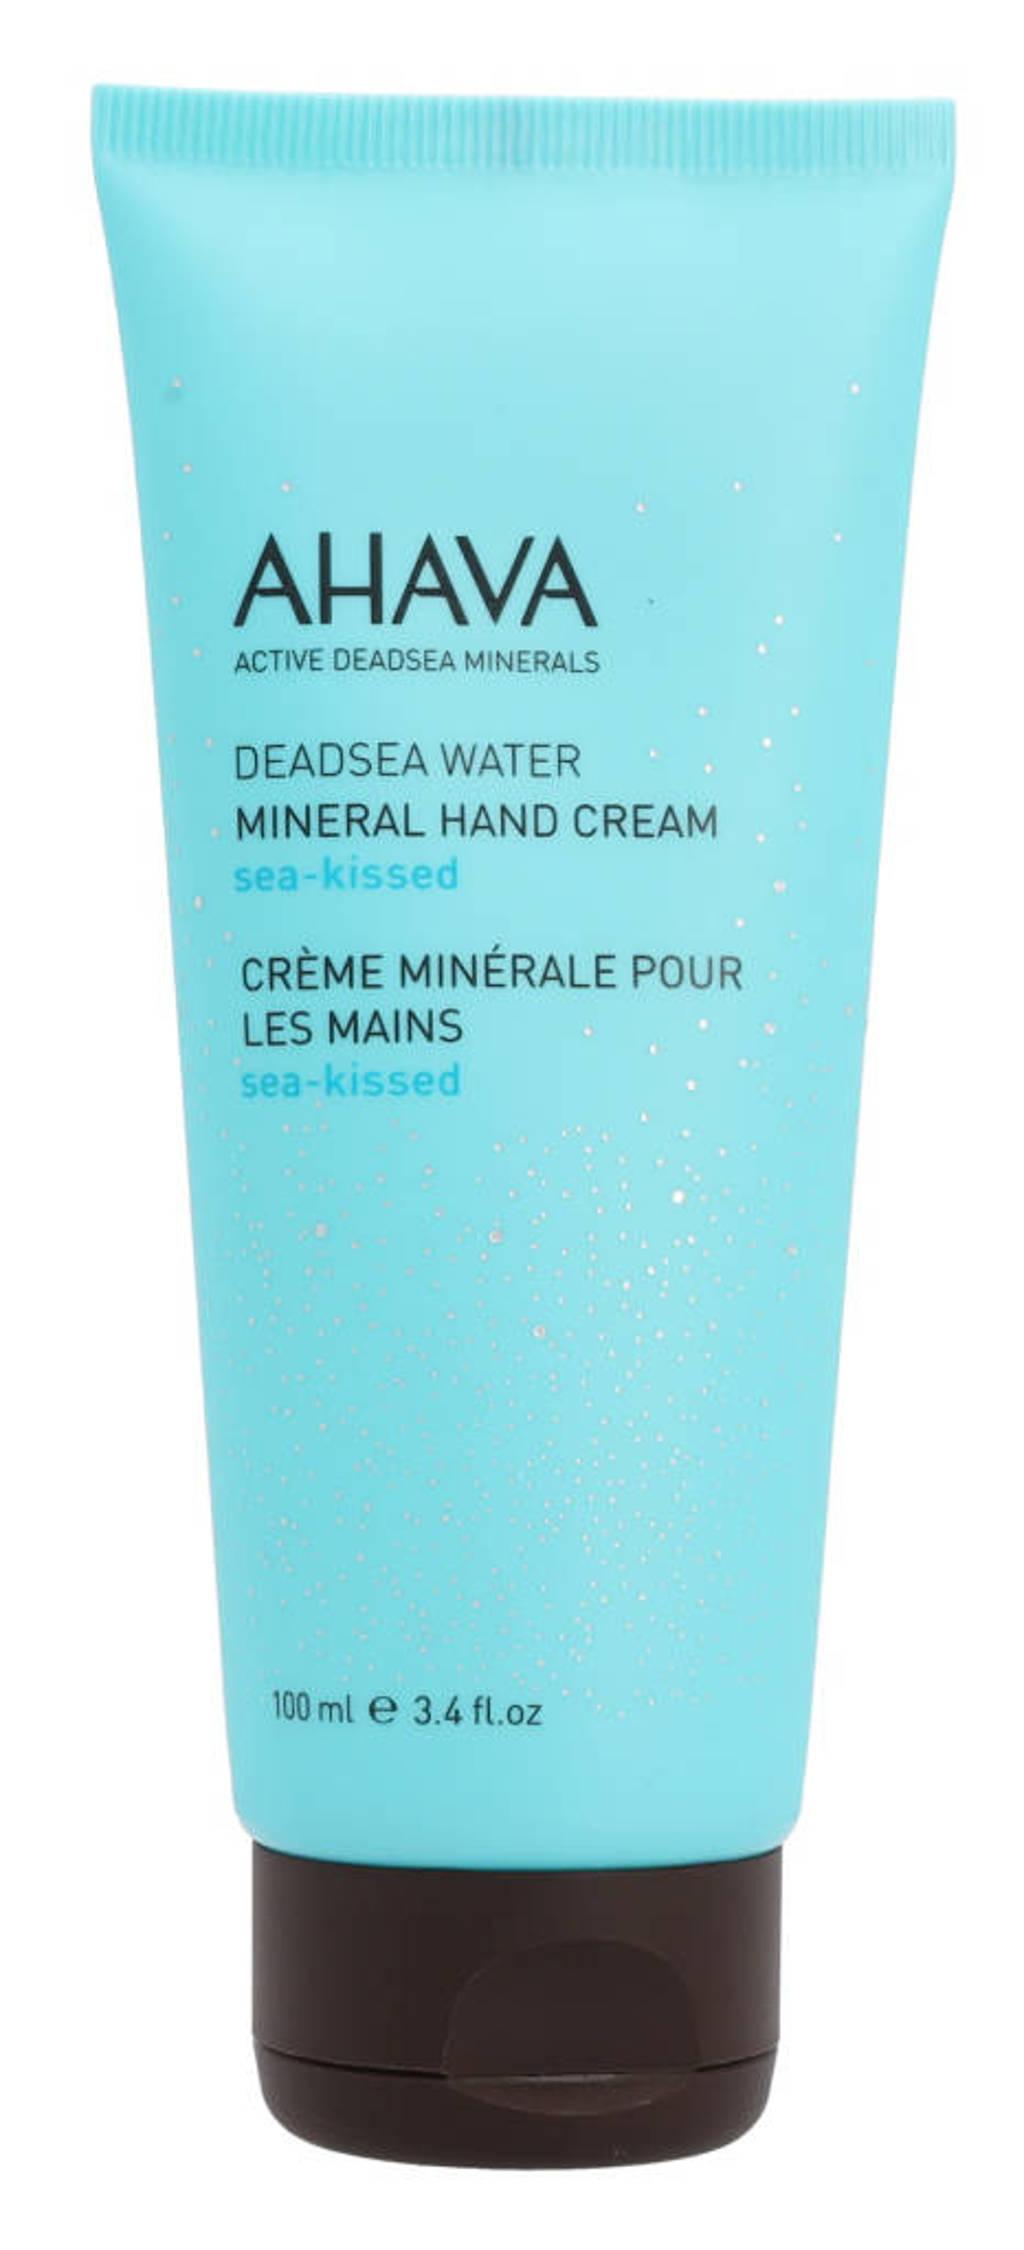 Ahava Deadsea Water Mineral Sea-Kissed handcrème